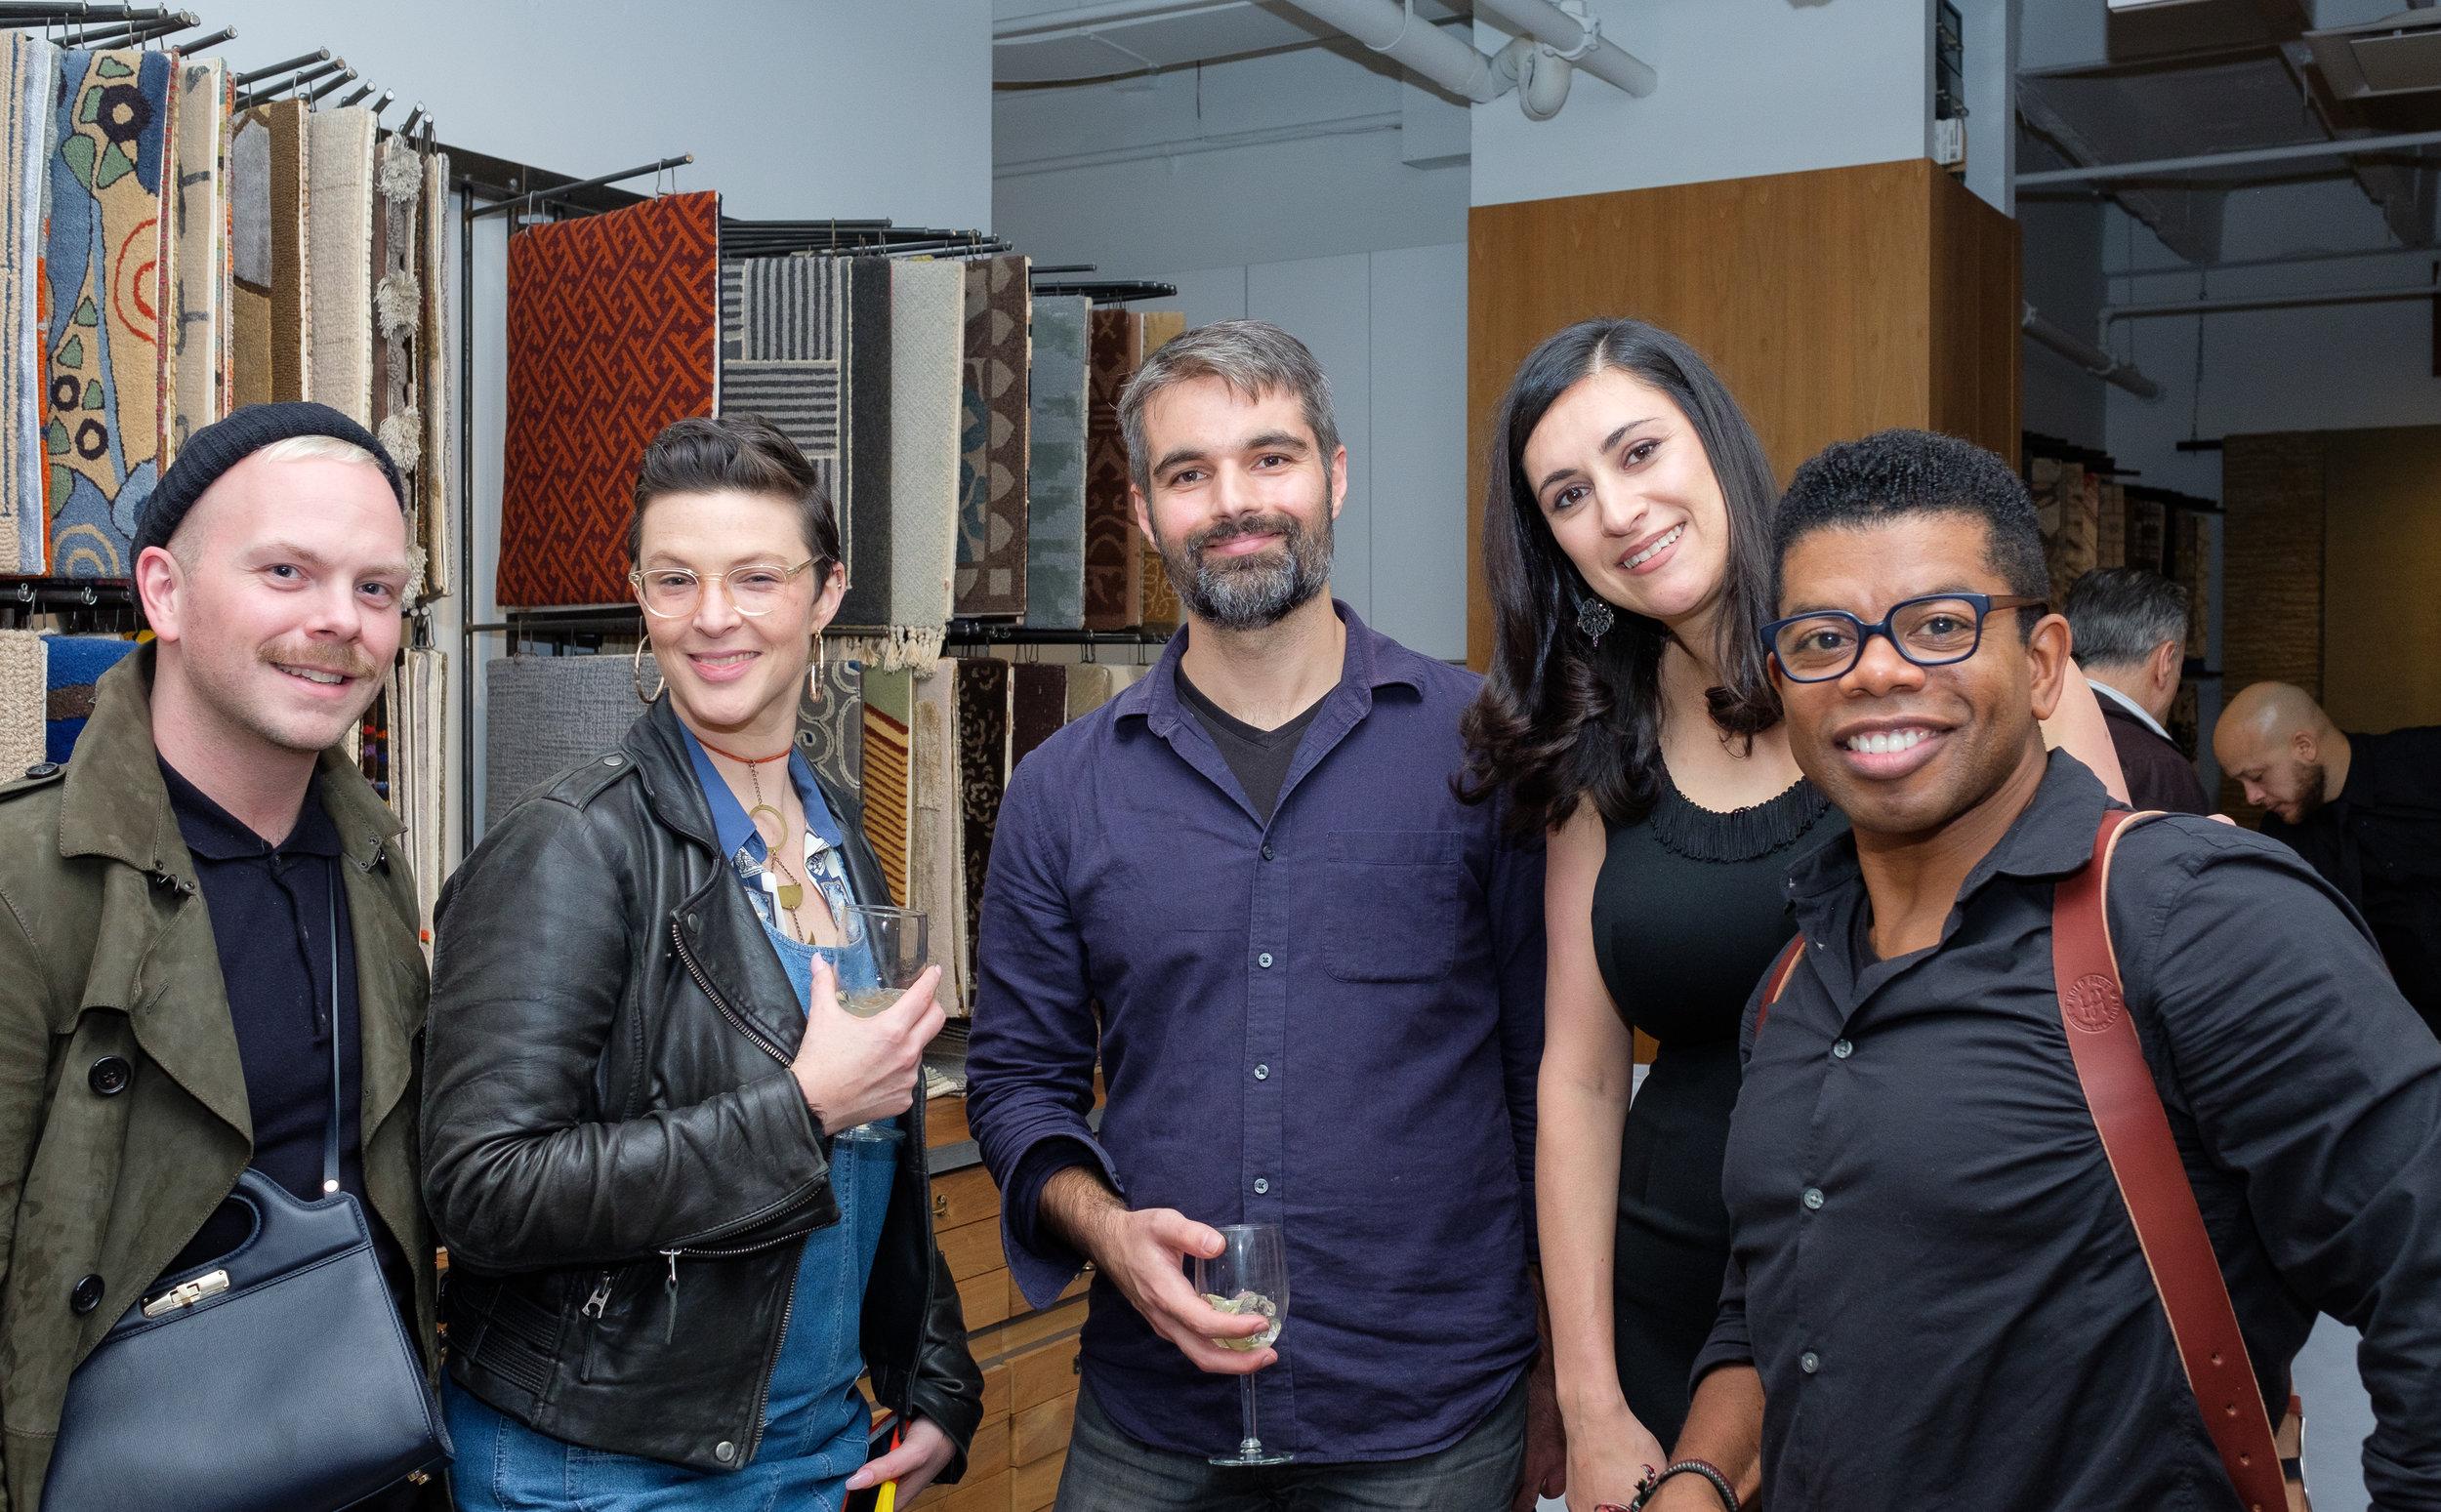 Dane Pressner, Lindsey Stamps, Dan Webre (all D'Aquino Monaco); Ariana Massouh (Edward Fields); Kirk Lawrence (photographer)